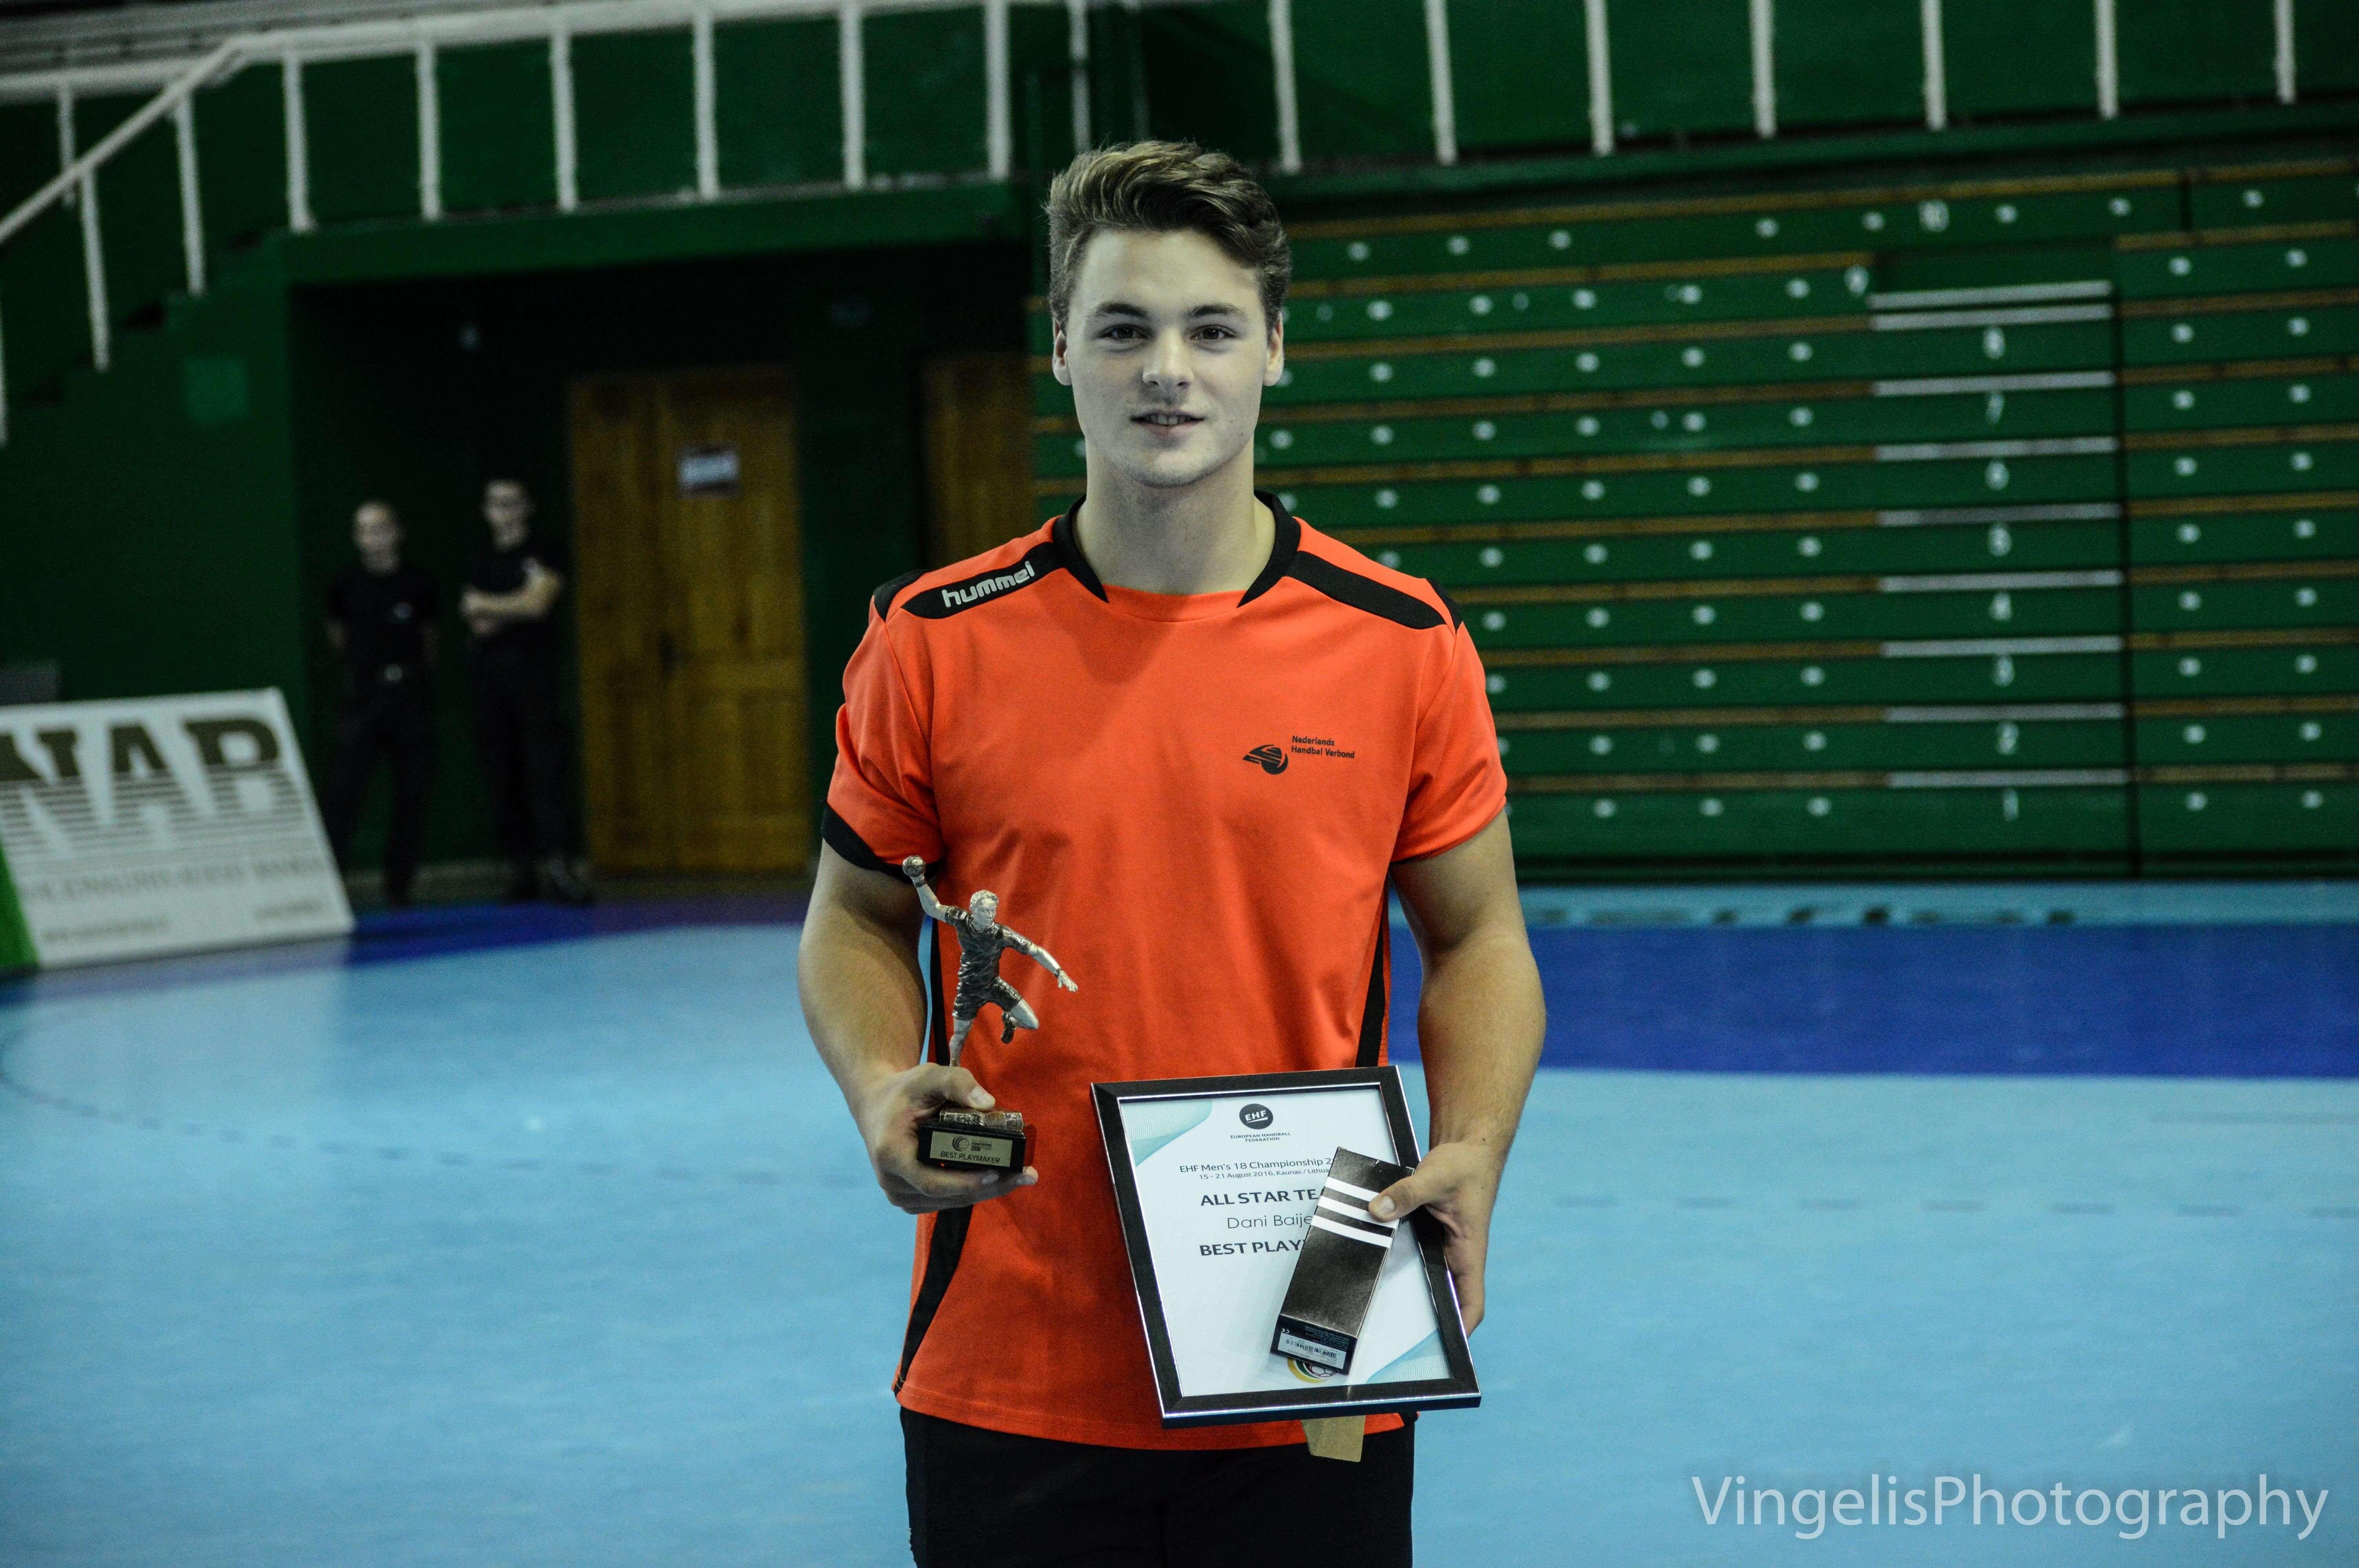 awards-ceremony-160821-7986